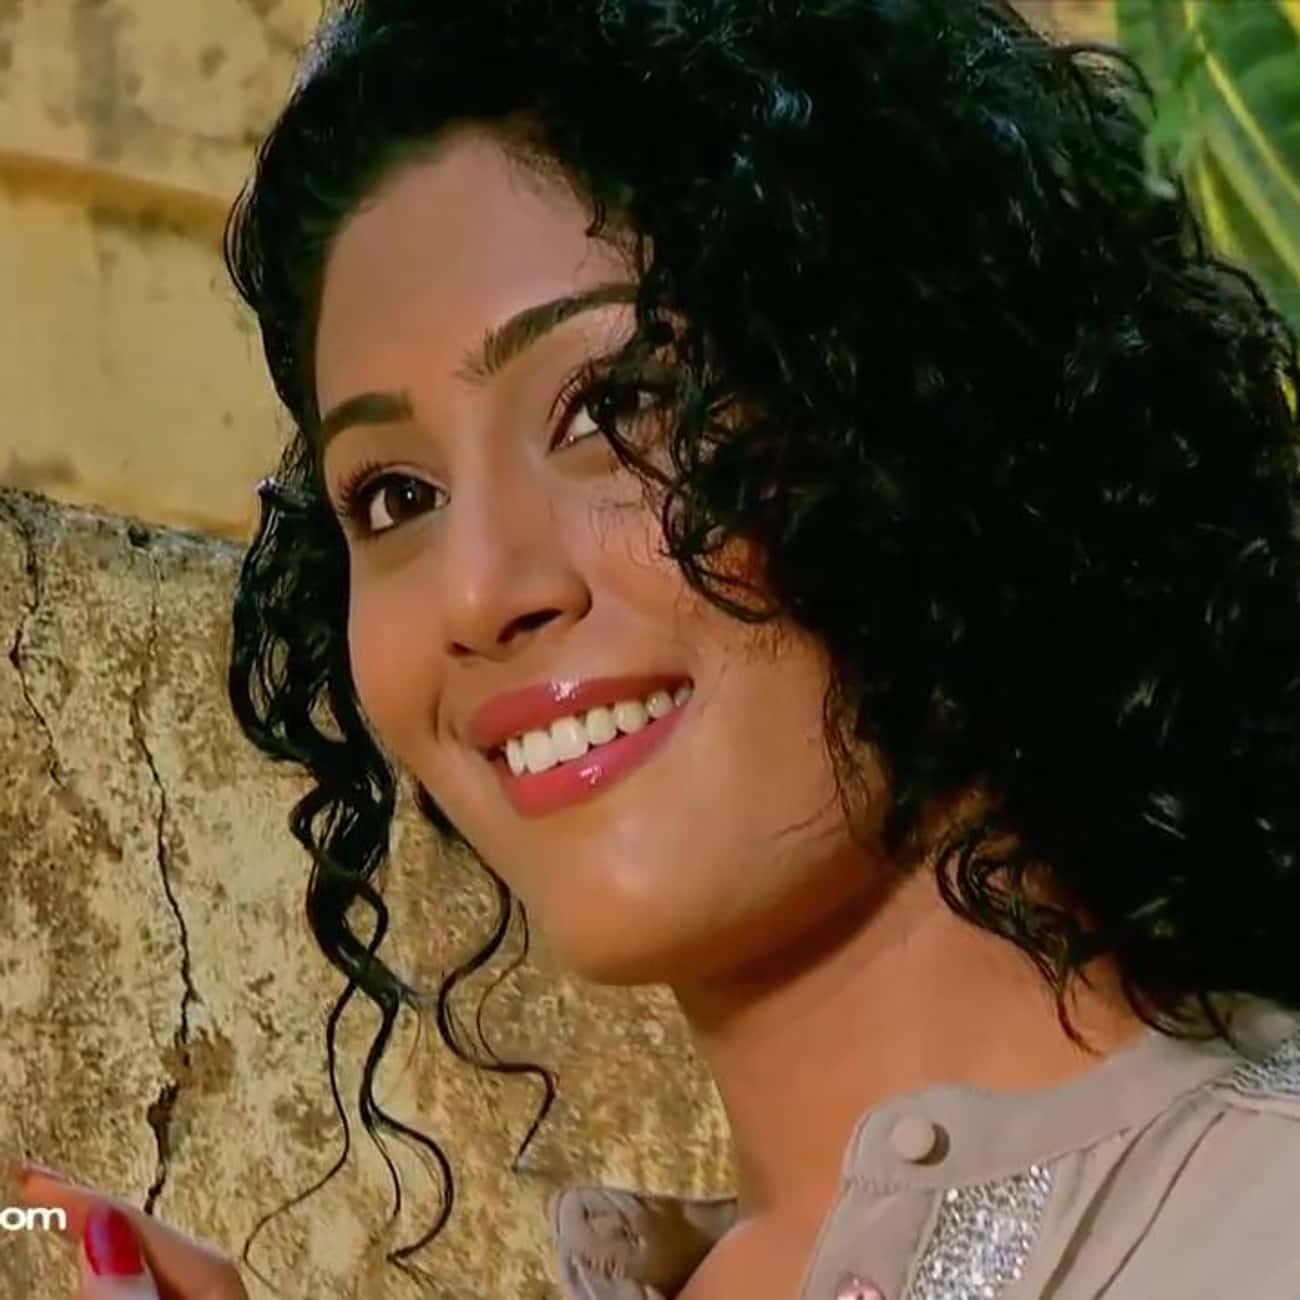 Chudail ka Raaz is listed (or ranked) 2 on the list The Best C.I.D. Episodes